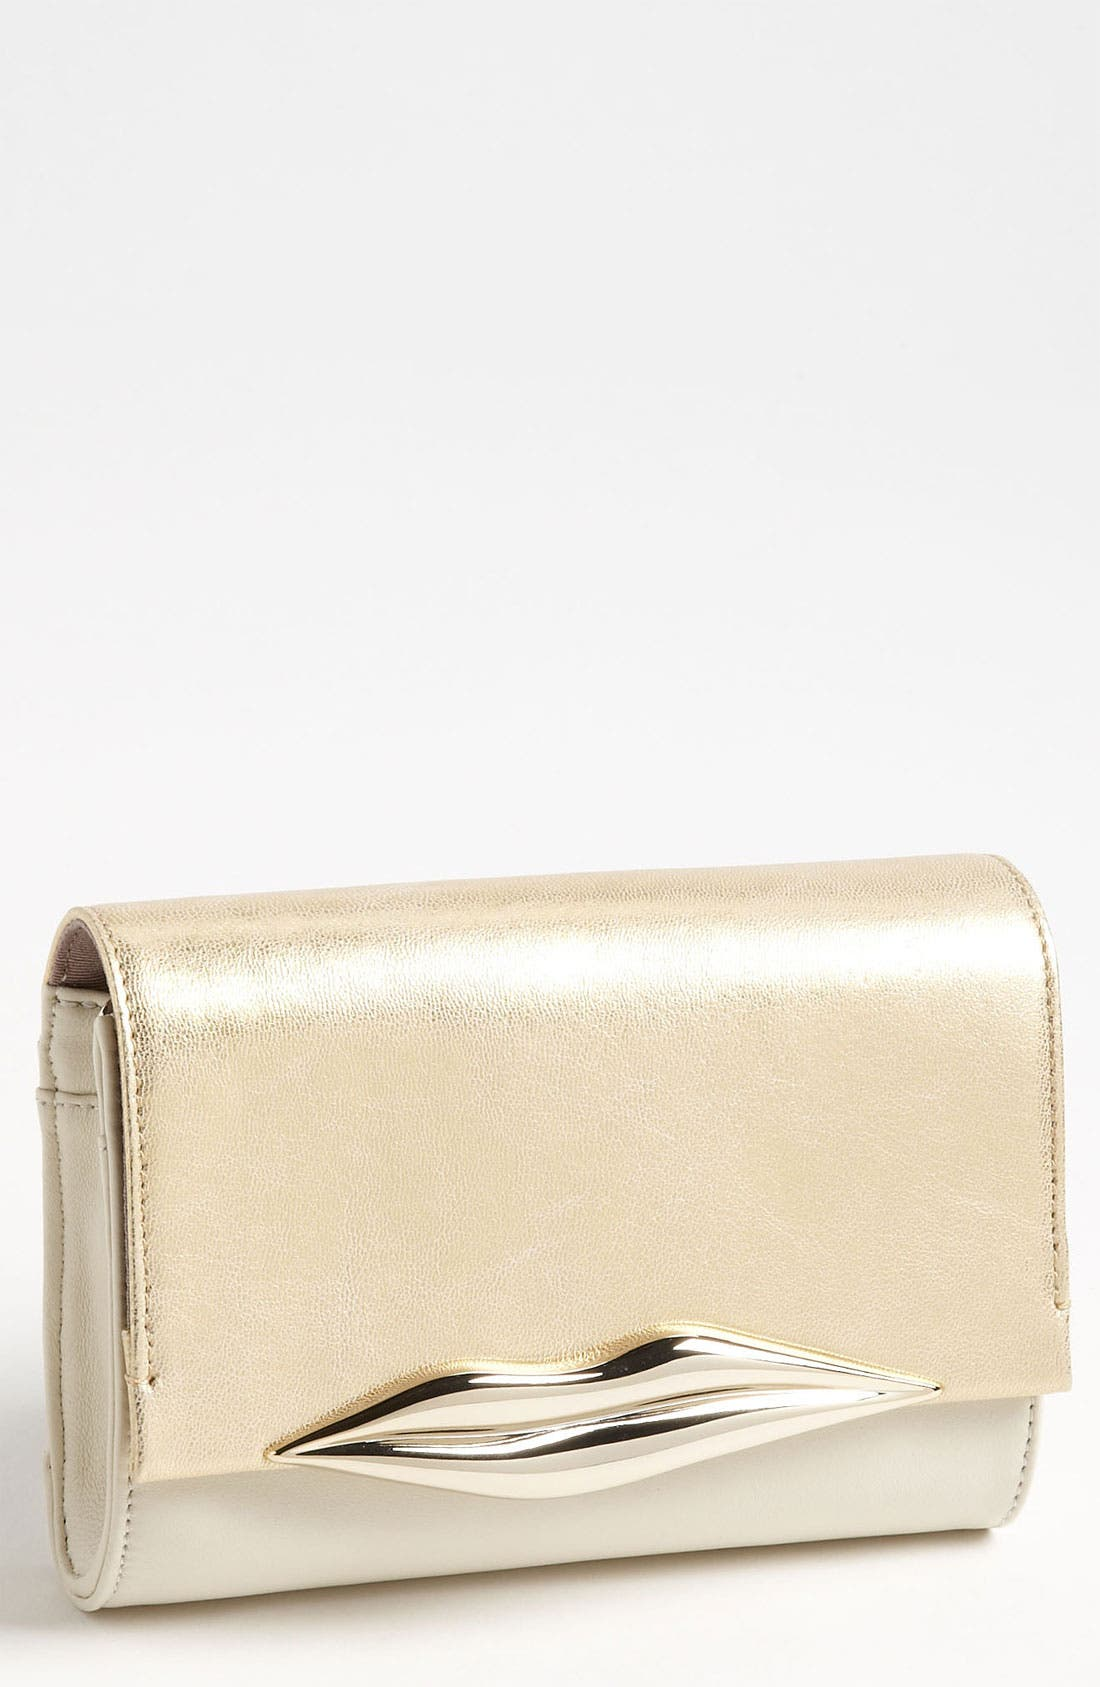 Main Image - Diane von Furstenberg 'Lips - Mini' Metallic Leather Clutch